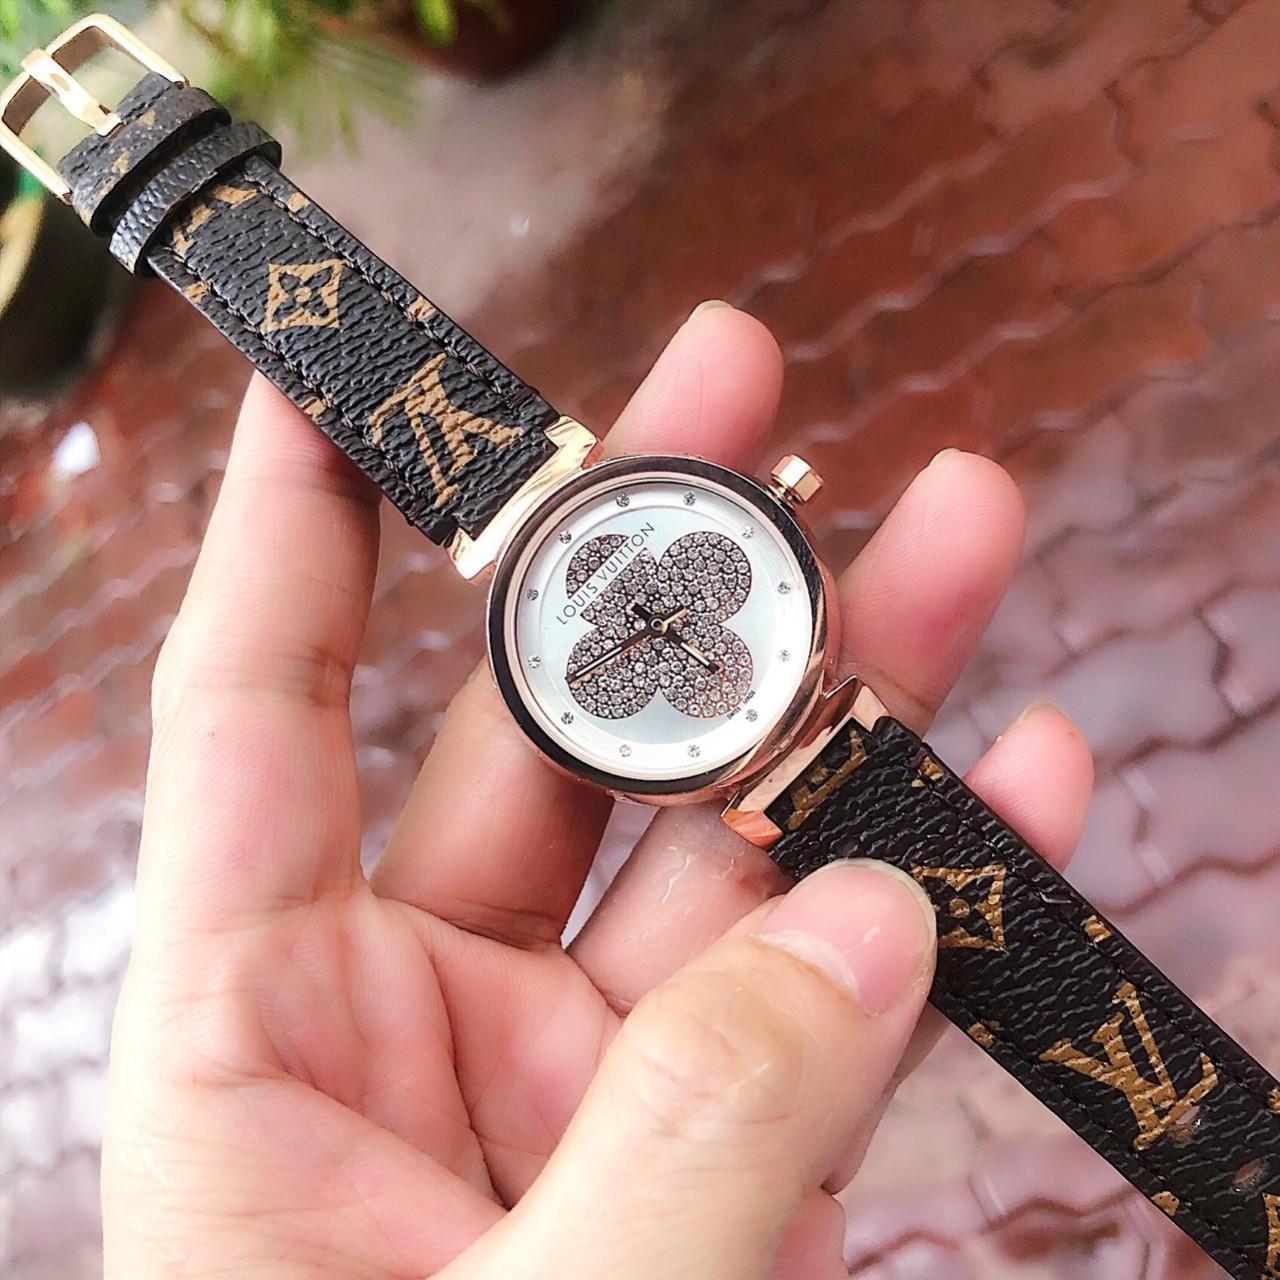 Đồng hồ thời trang nữ Louis vuitton Dây Da Cao Cấp - Size 33mm - Fullbox bán chạy